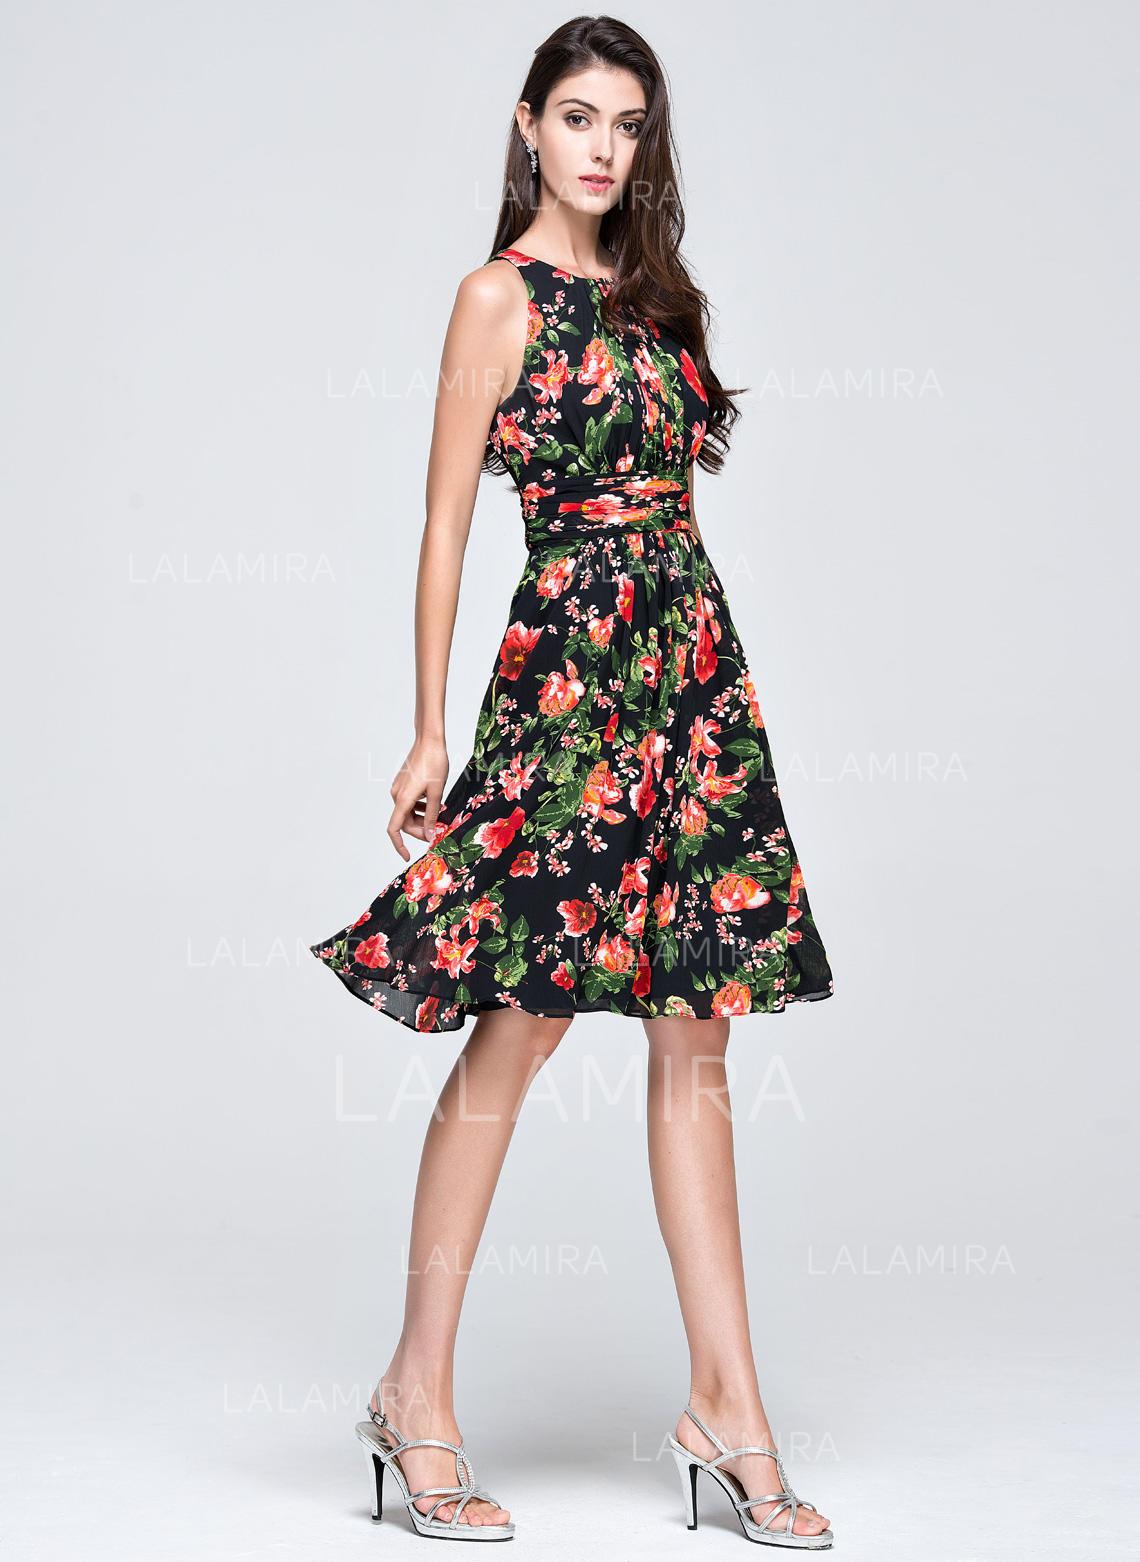 Zipper Up Chiffon Prom Dresses